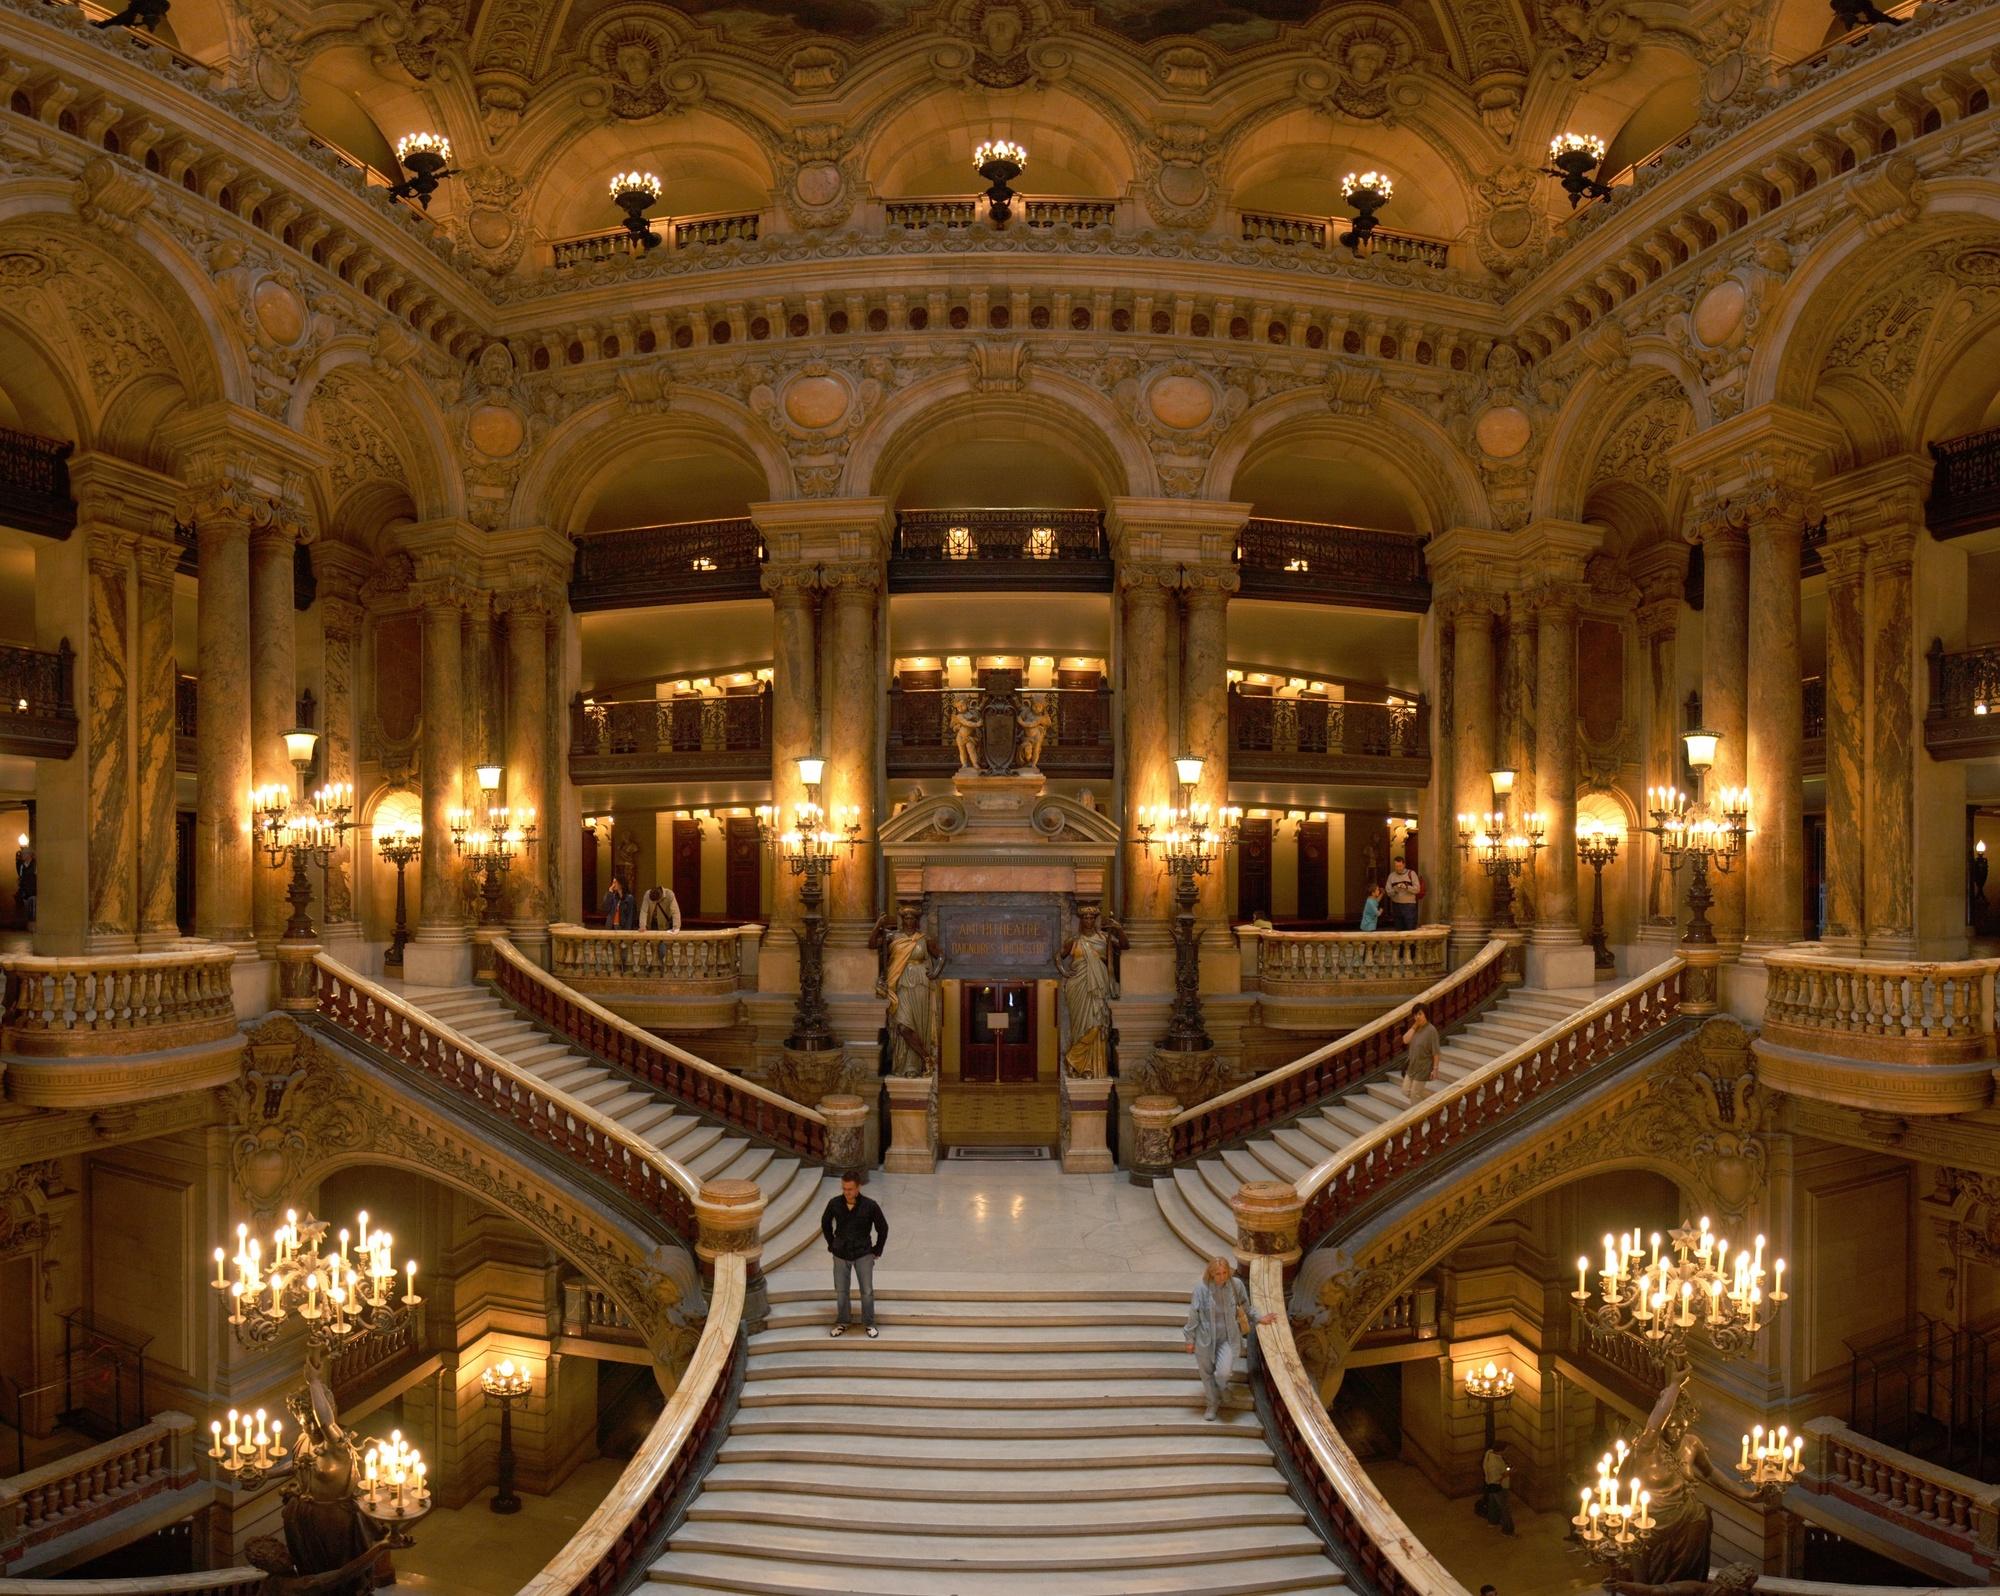 690-opera_garnier_grand_escalier-paris.jpg